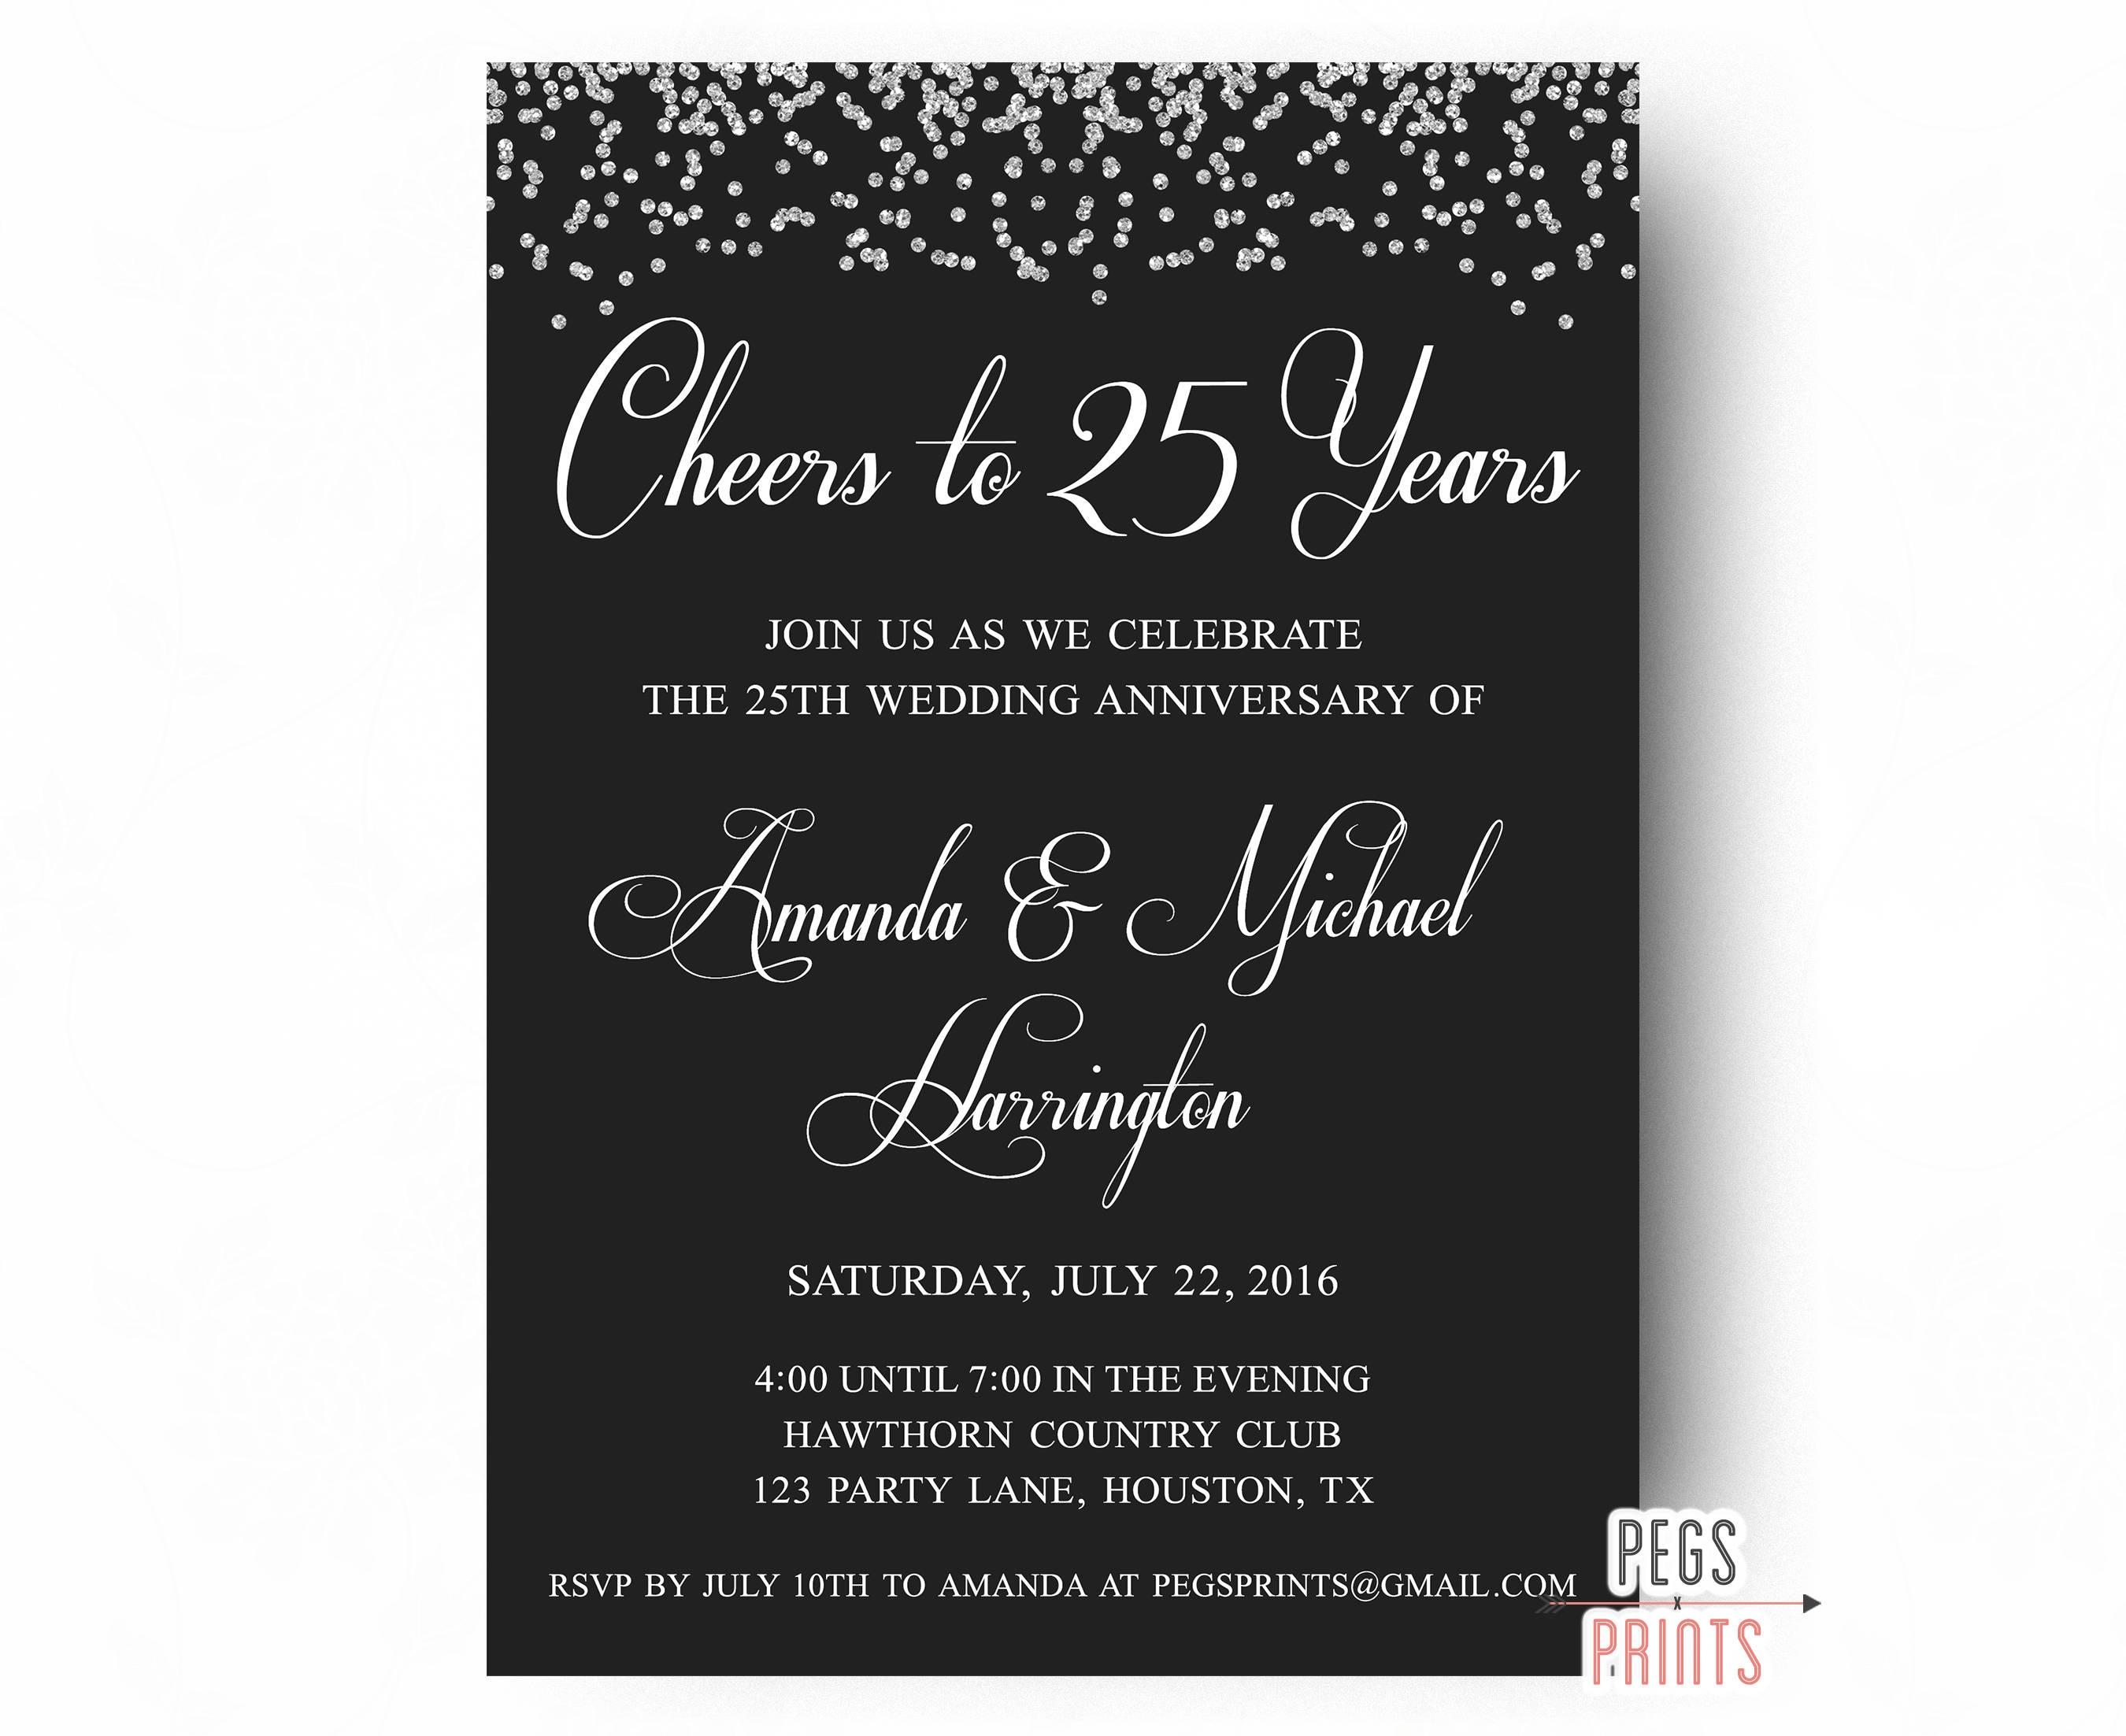 25th wedding anniversary invitations printable 25th ampliar solutioingenieria Gallery